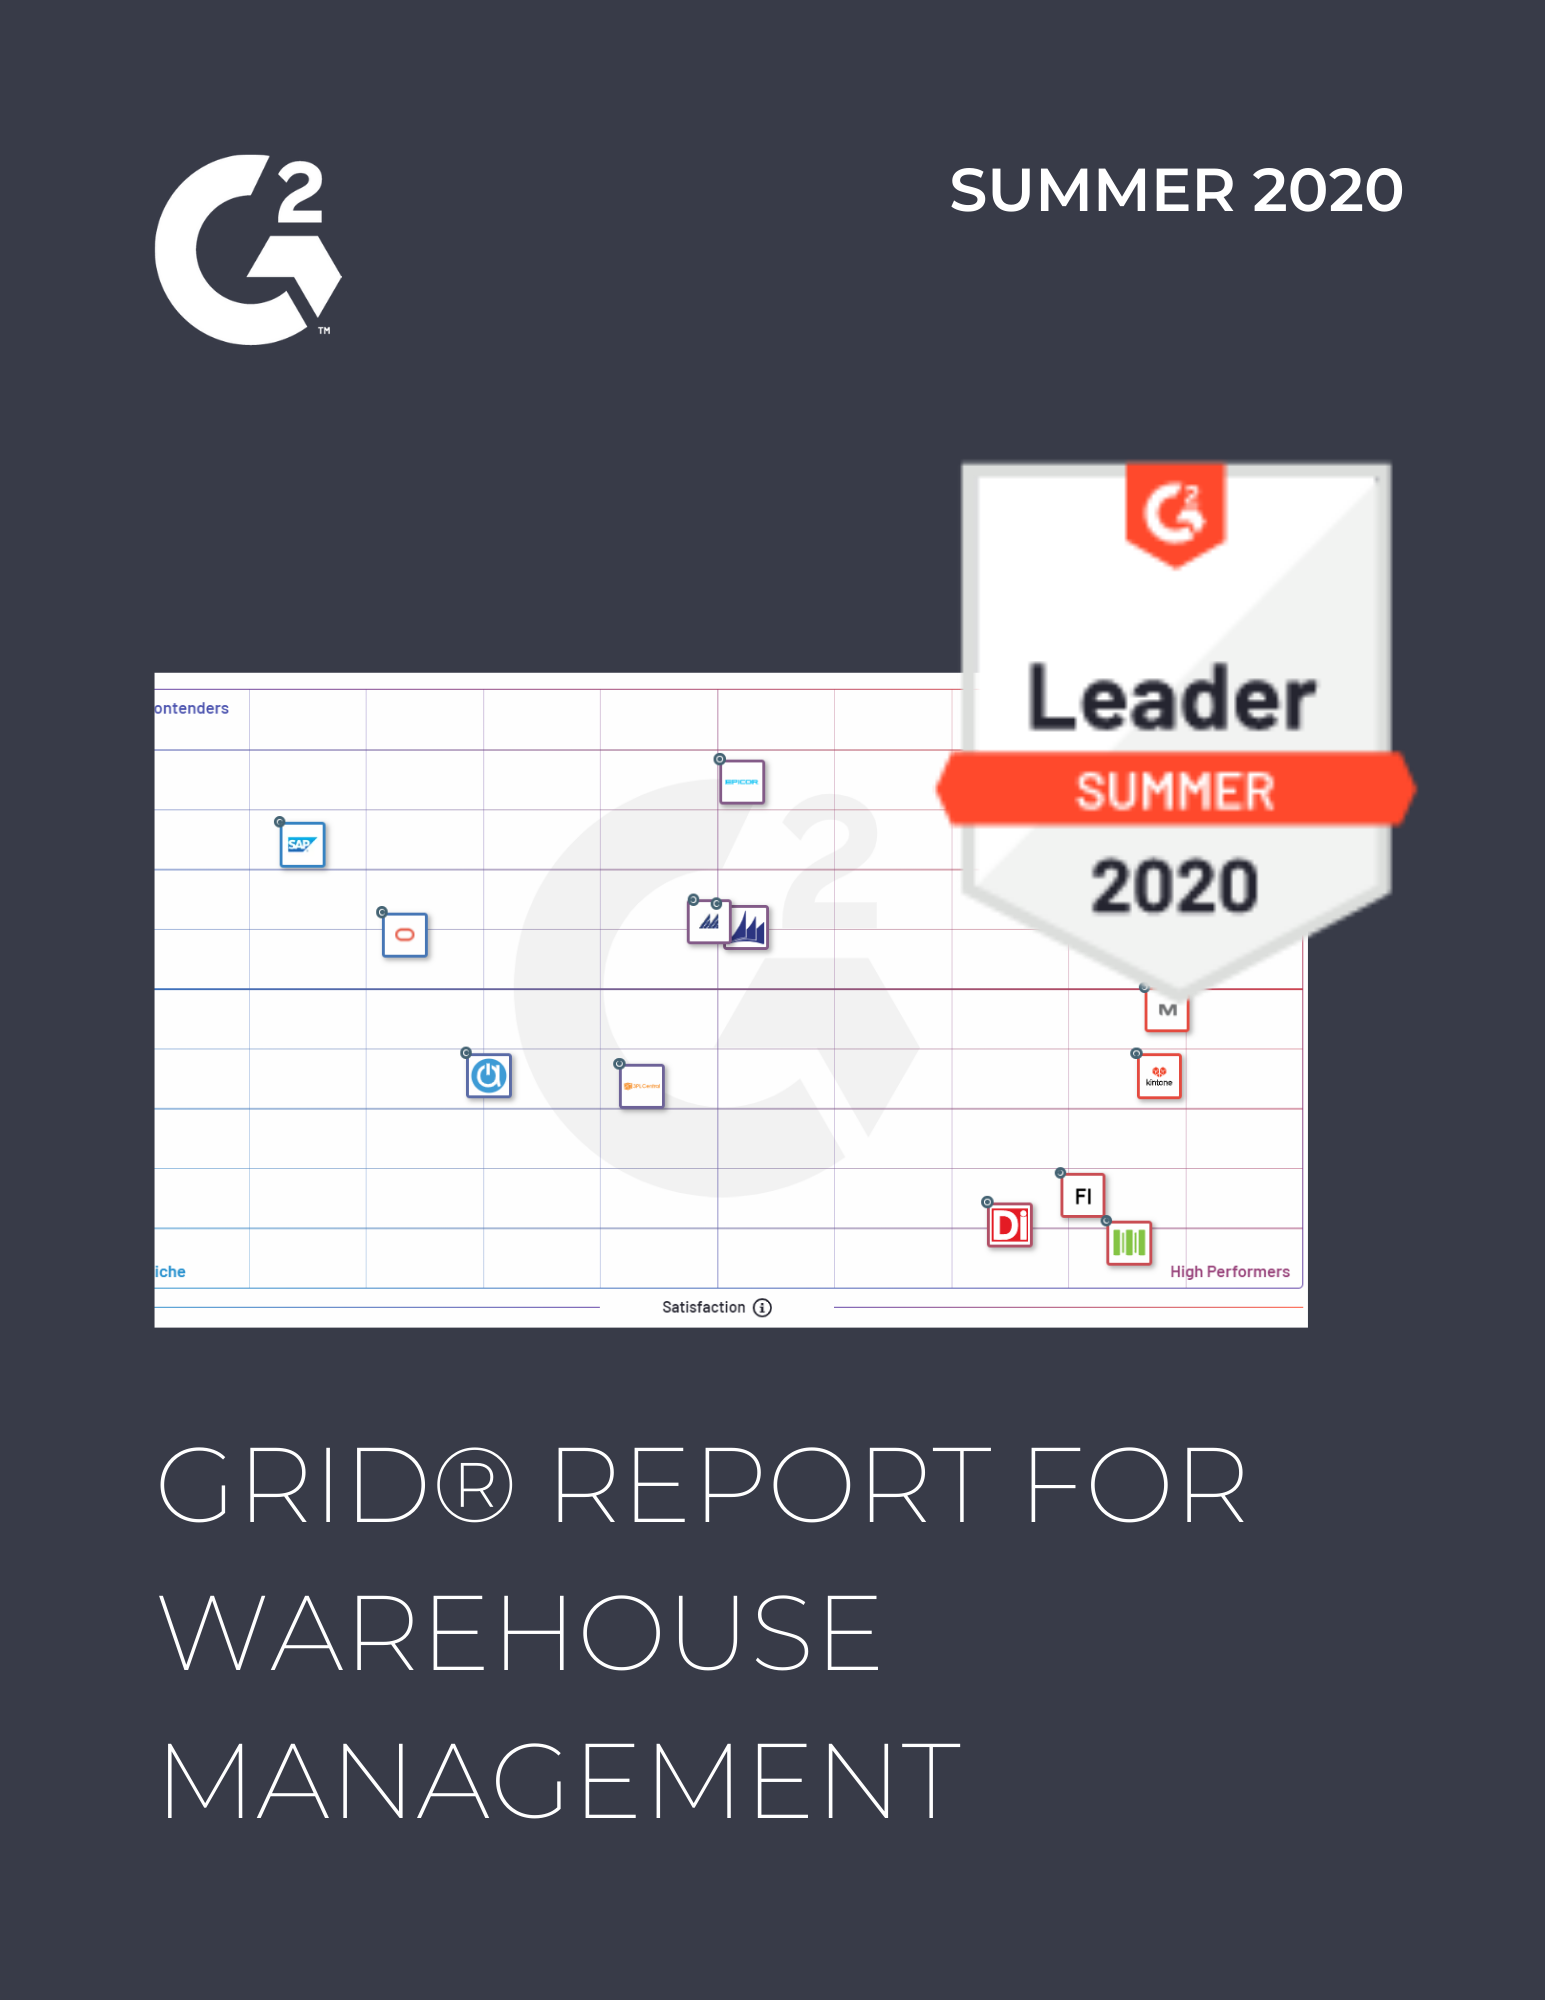 G2 Grid Report